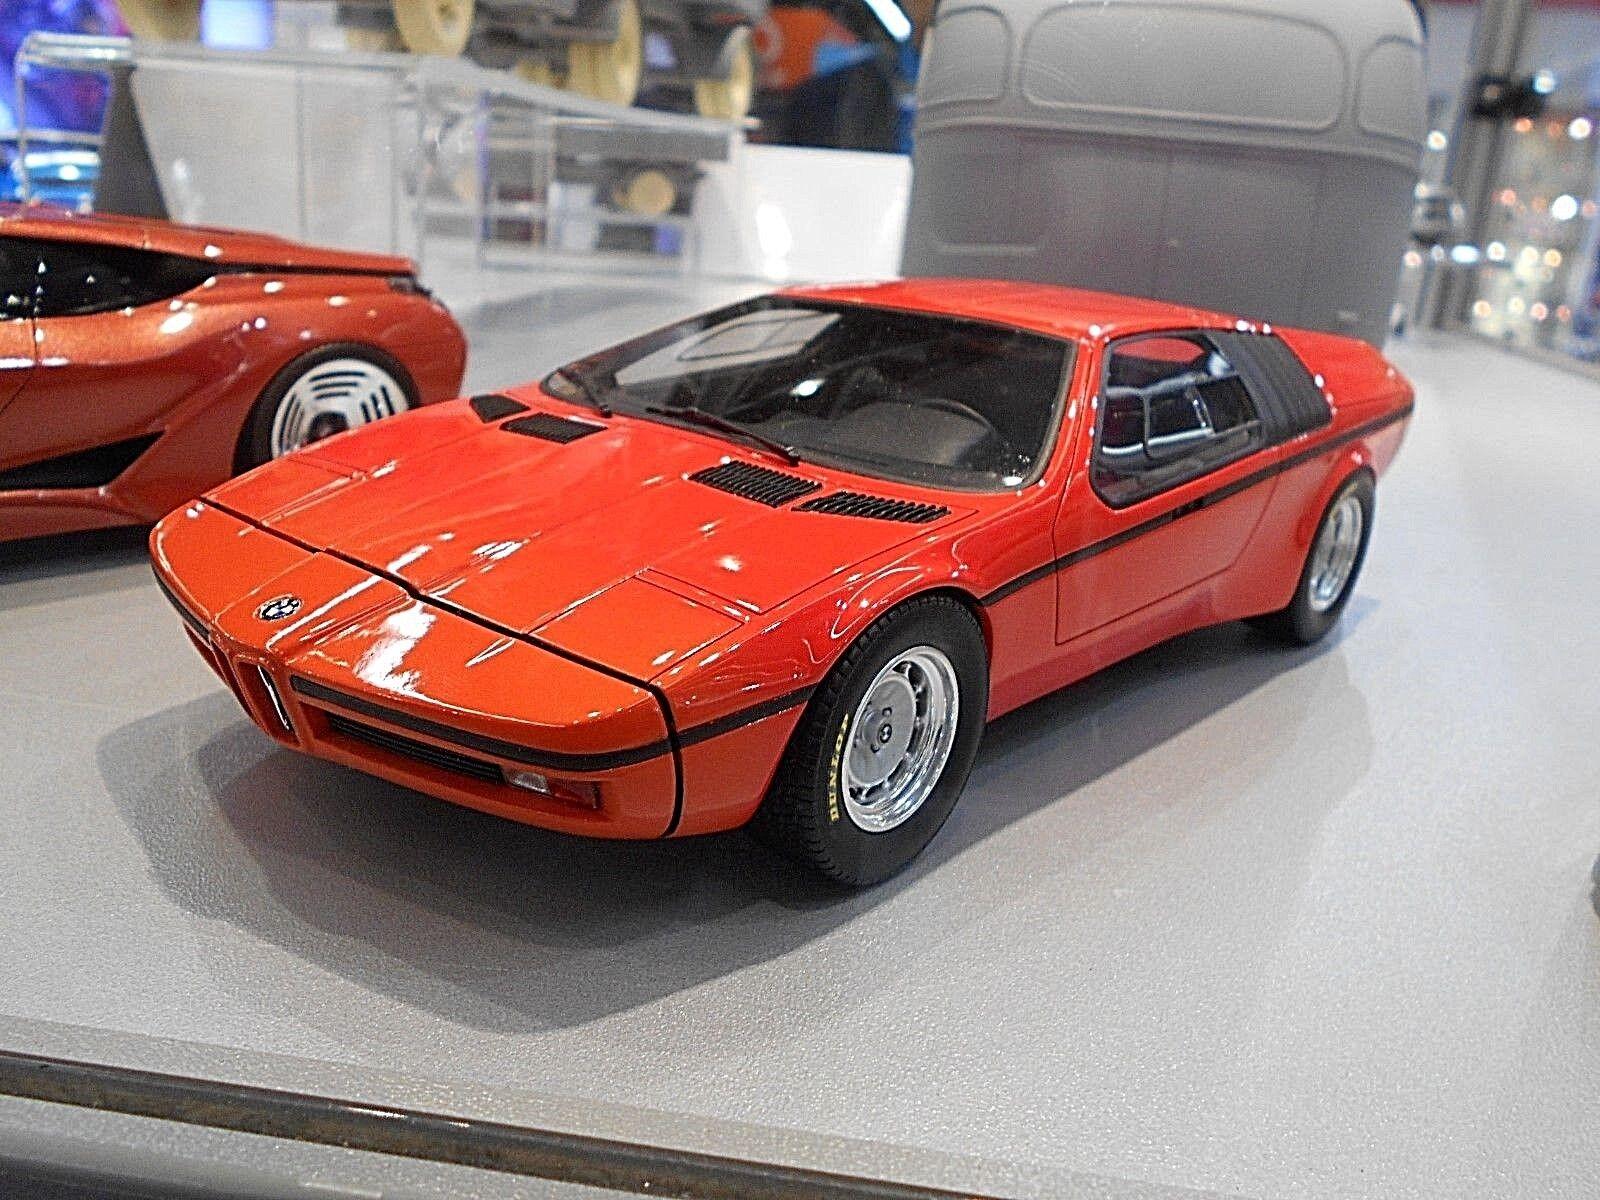 BMW M1 Turbo Turbo Turbo Concept Studie X1 E25 orange 1972 Resin RAR Schuco 1 18 a21698